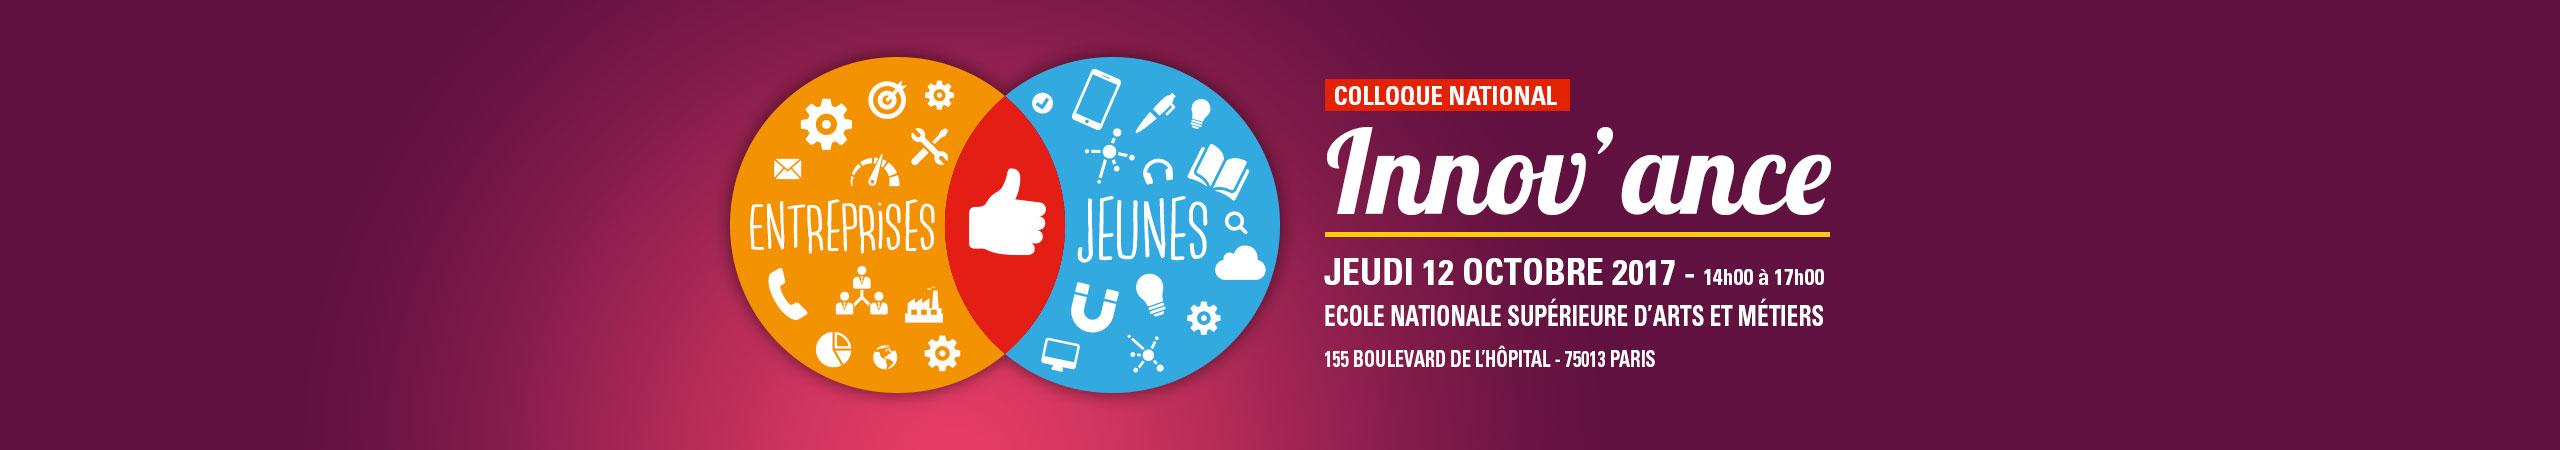 AJE Colloque national innovance 2017